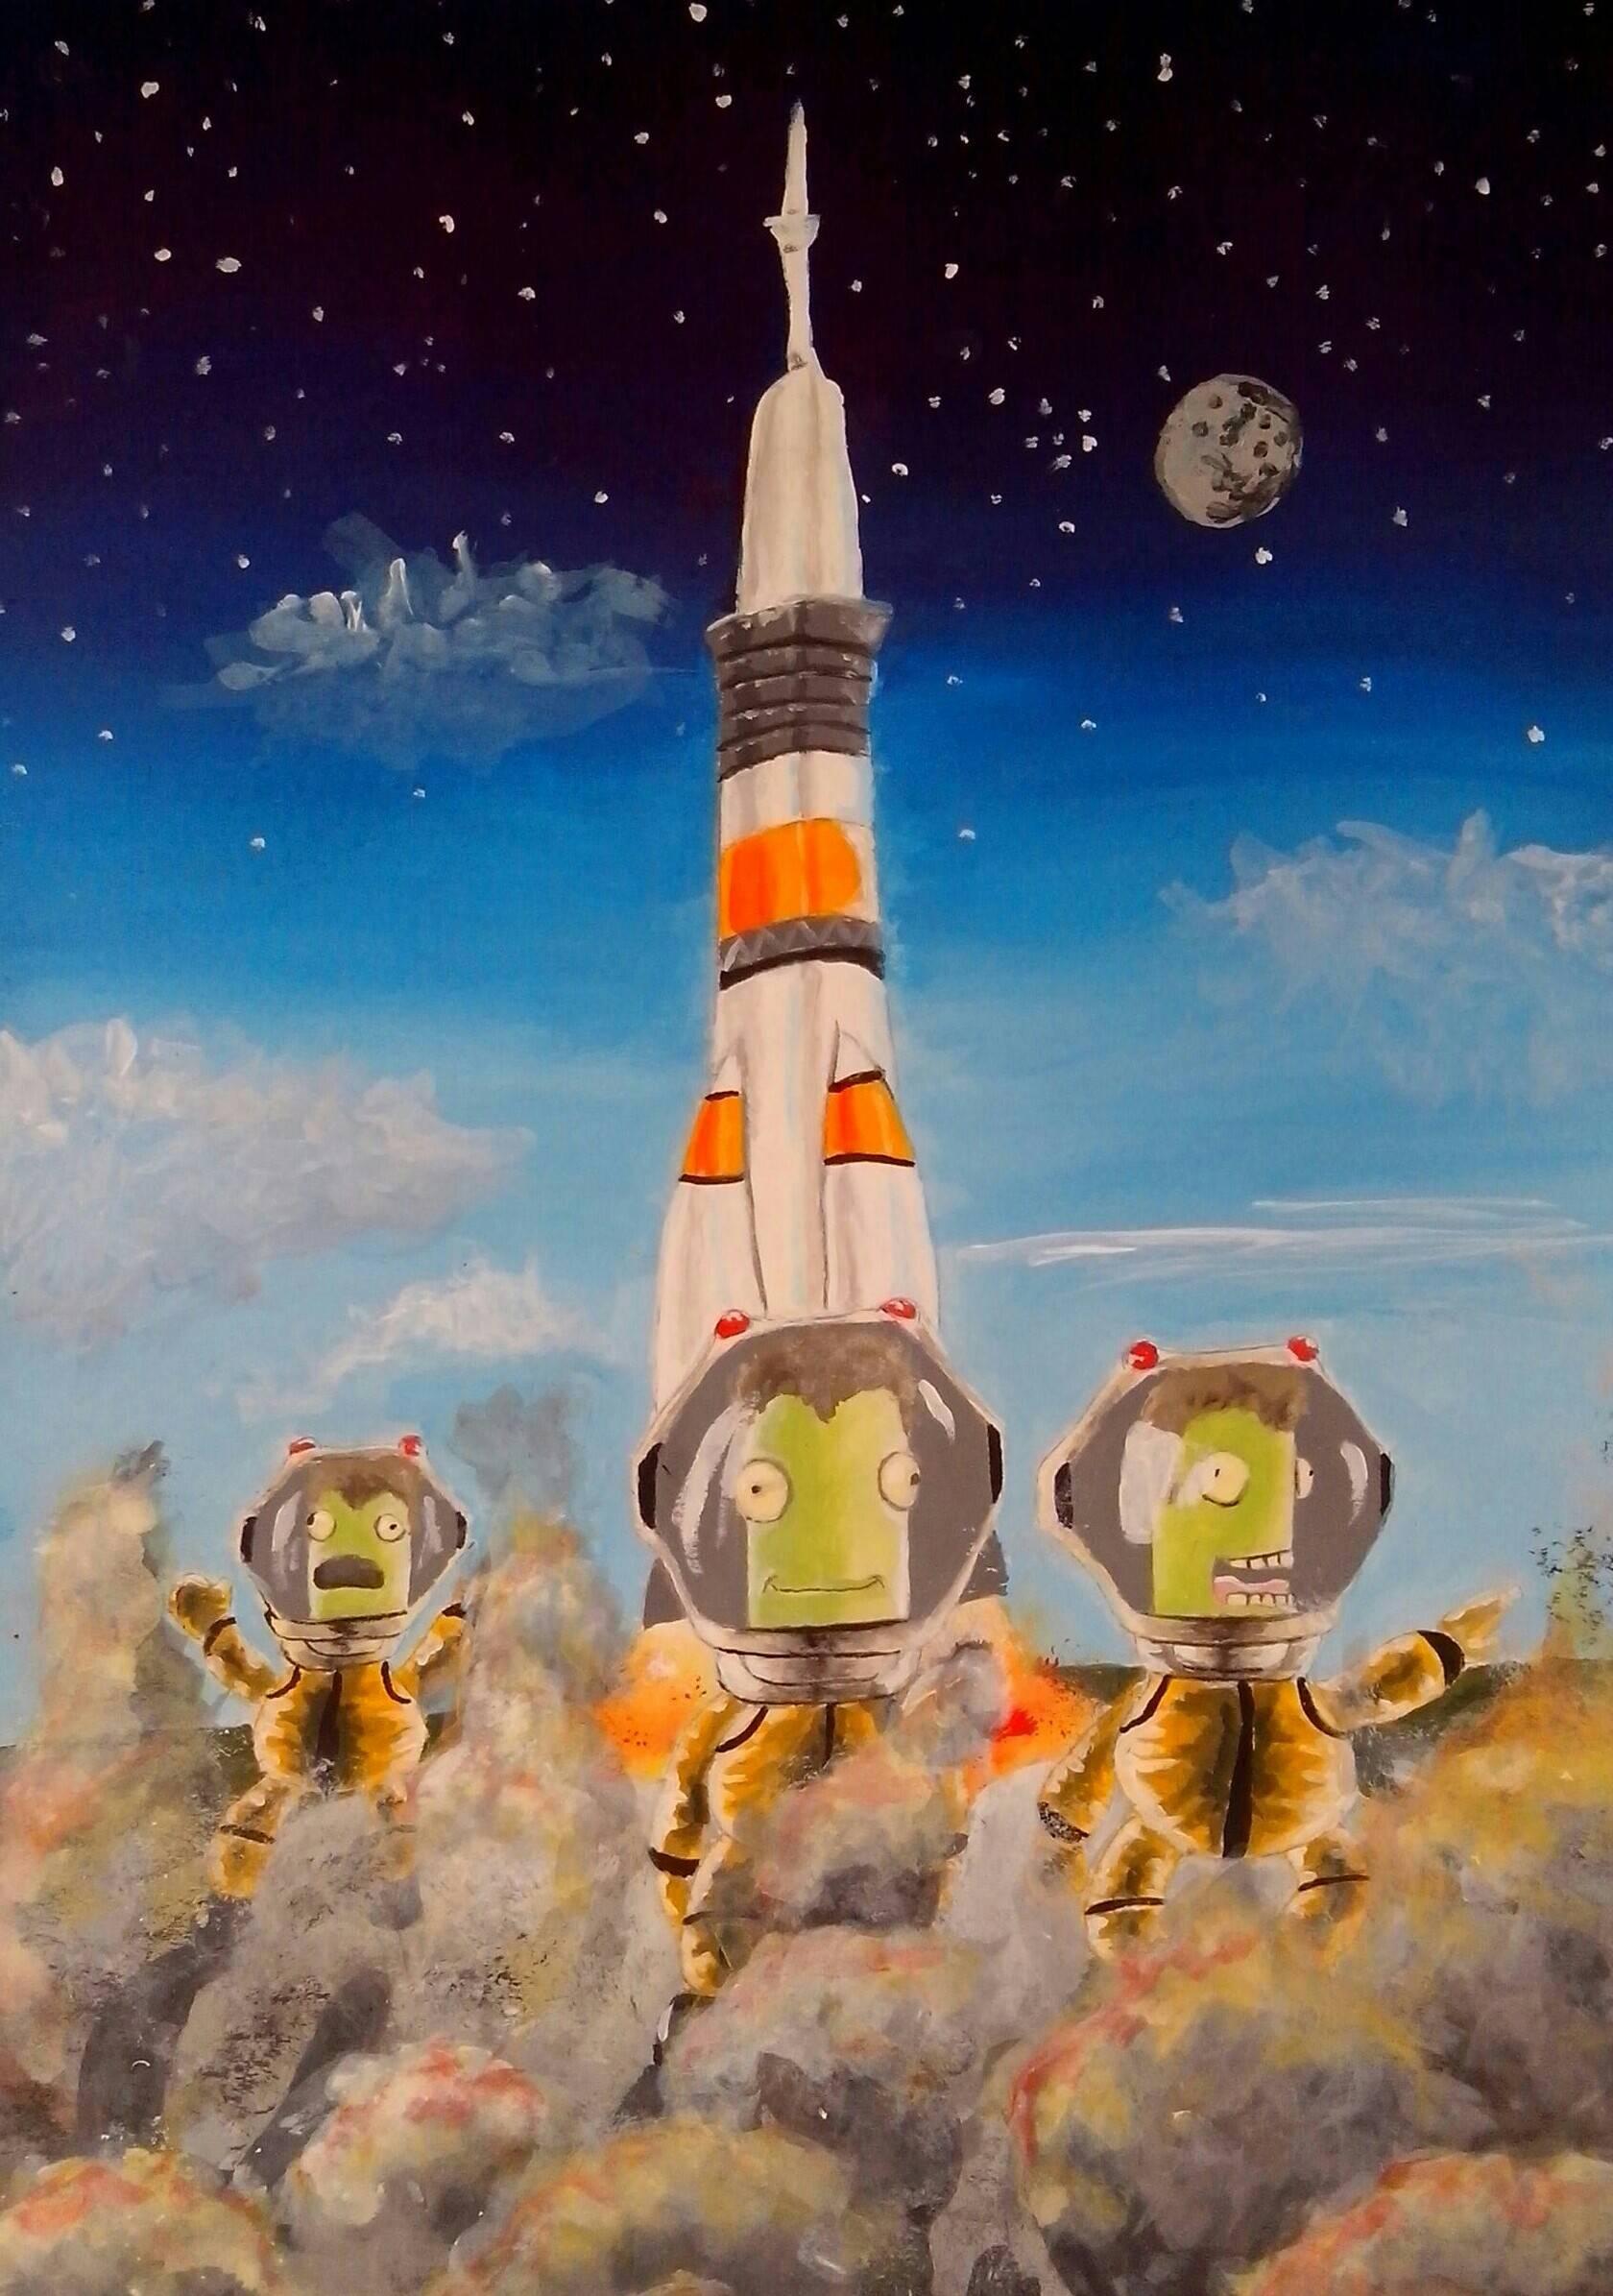 Kerbal space program by pringlesaddict99 on deviantart - Wallpaper kerbal space program ...